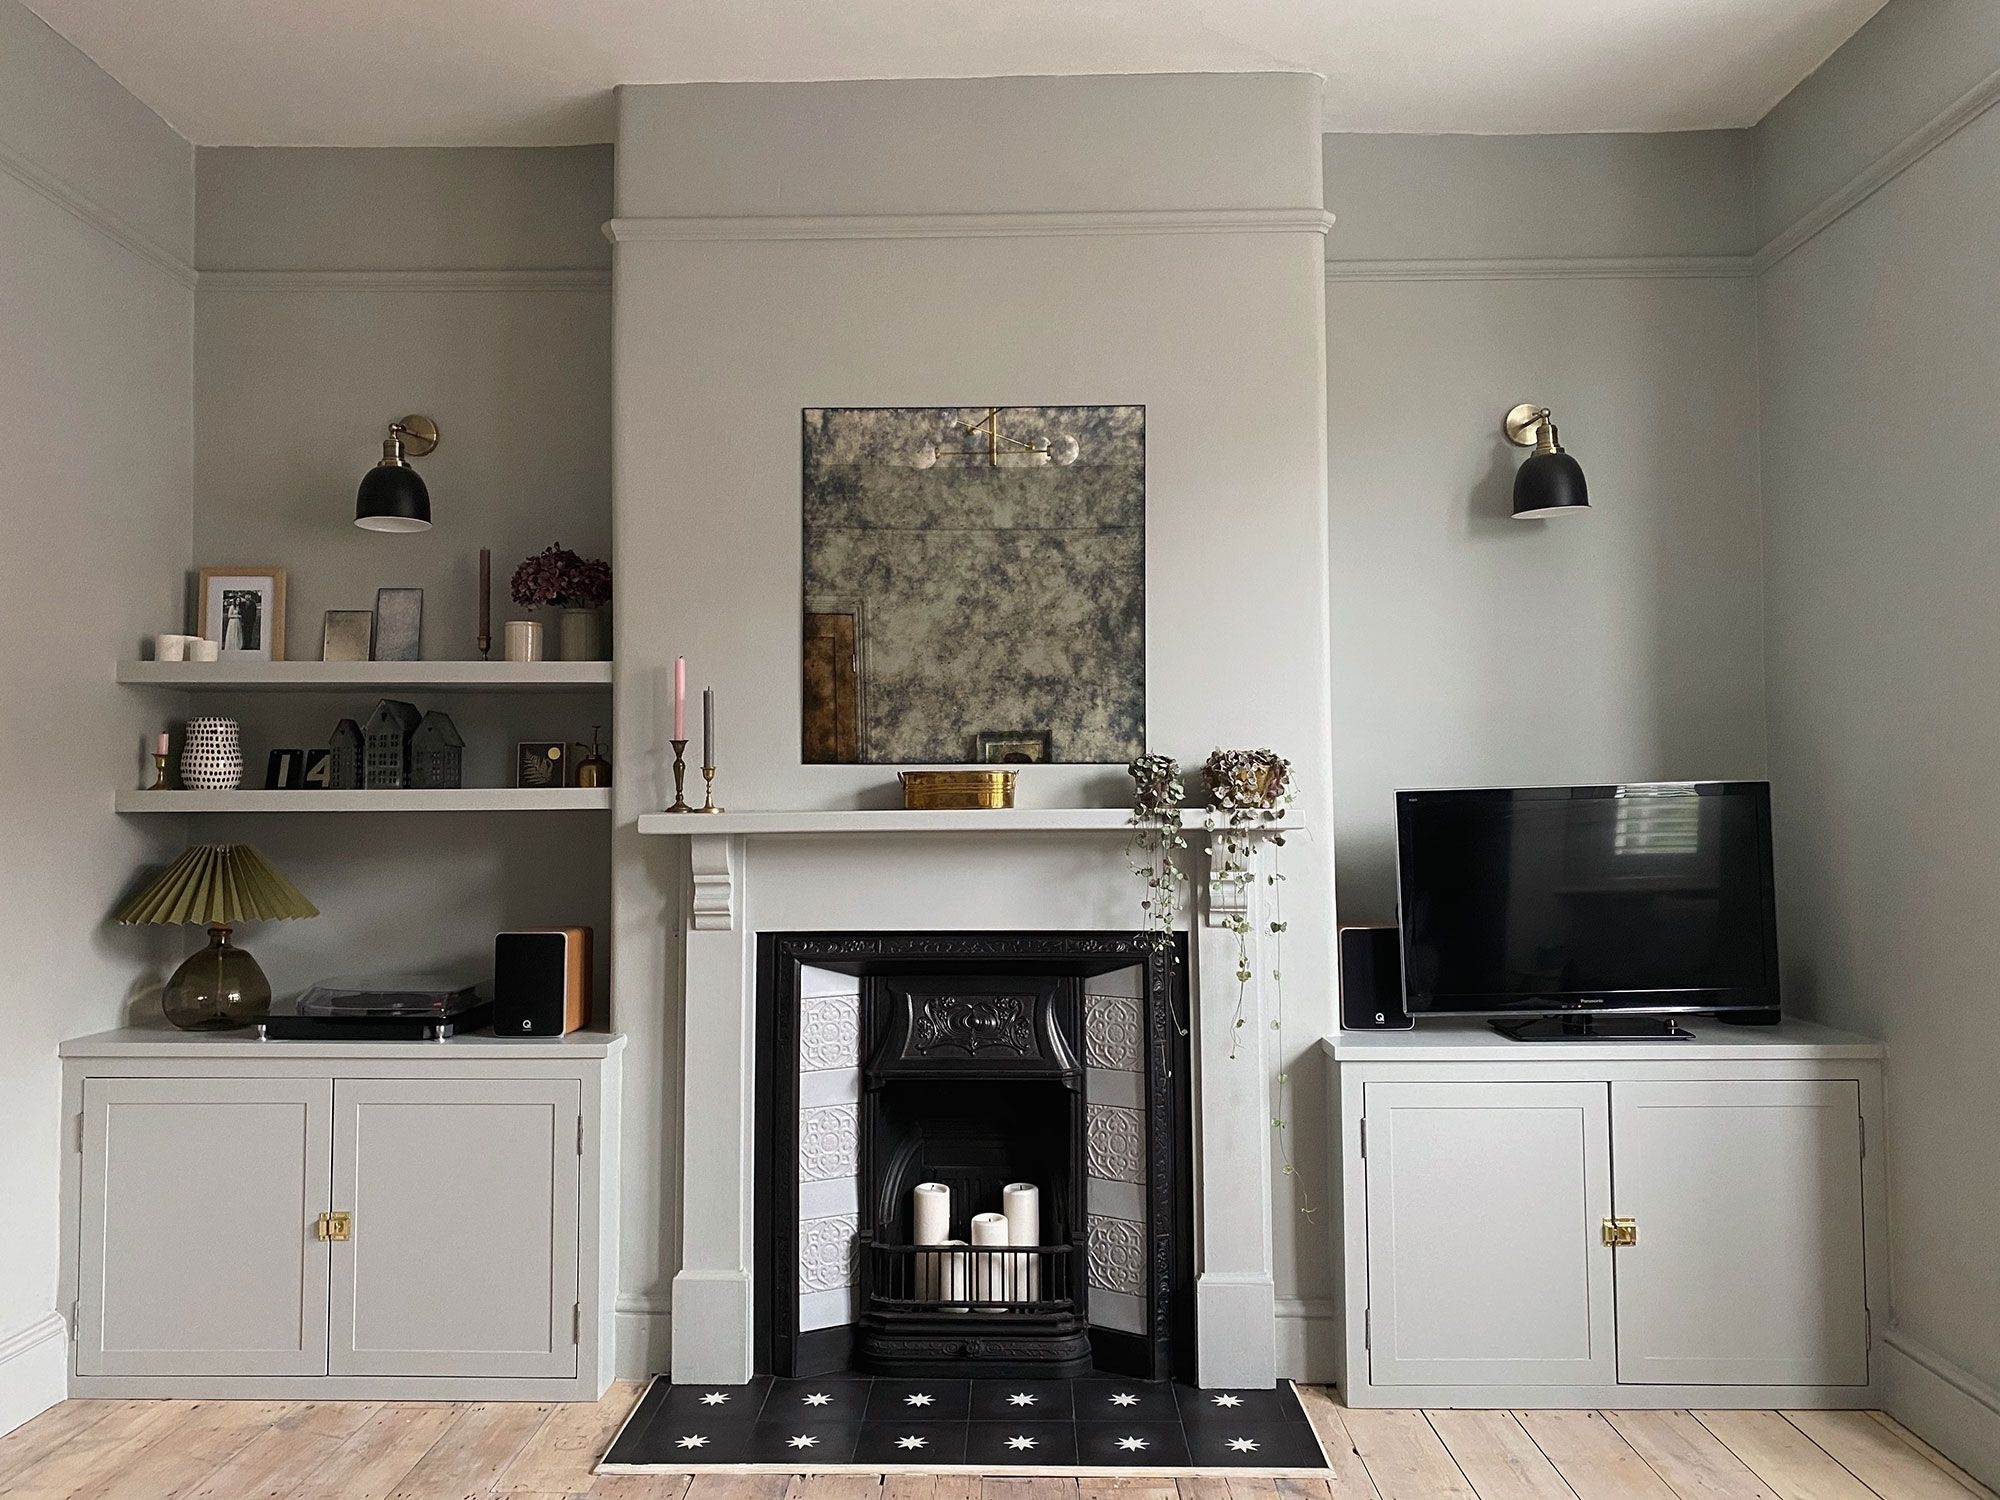 Jessi Harris living room interior